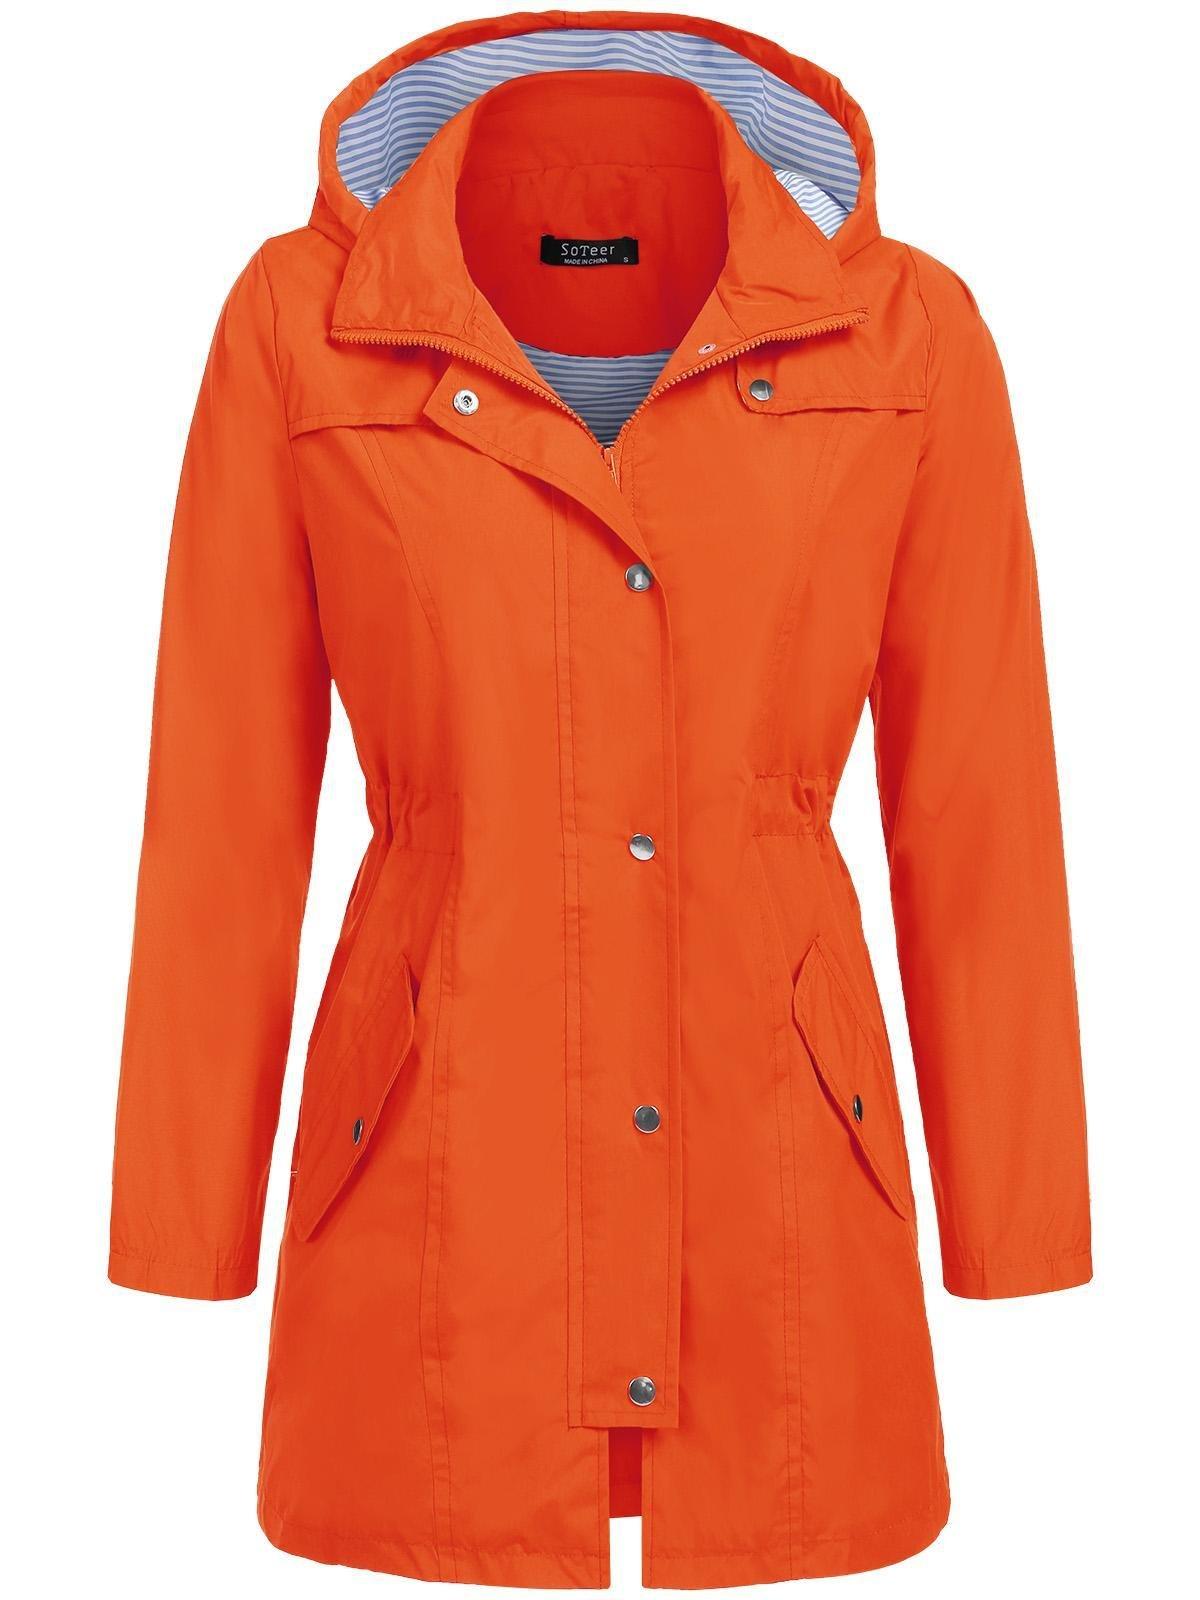 SoTeer Women's Casual Long Sleeve Contrast Color Hooded Coat Softshell Jacket (Orange, XXL)